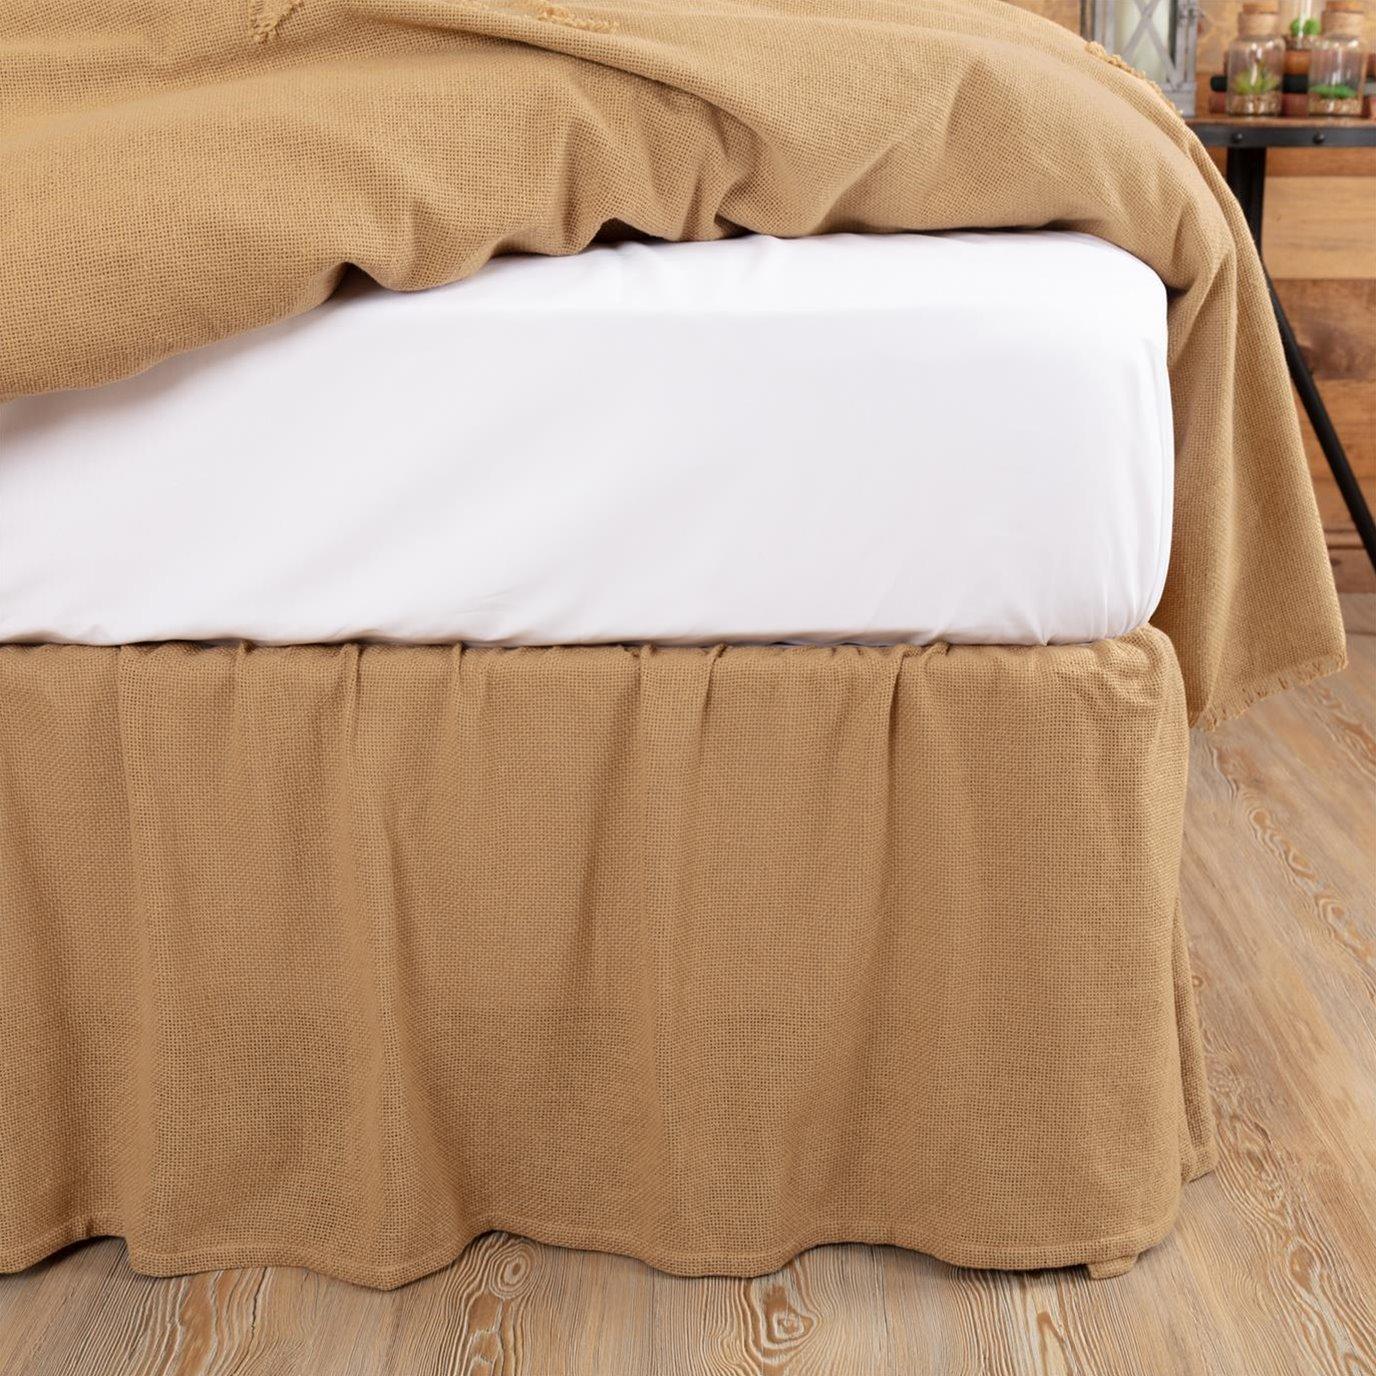 Burlap Natural Ruffled King Bed Skirt 78x80x16